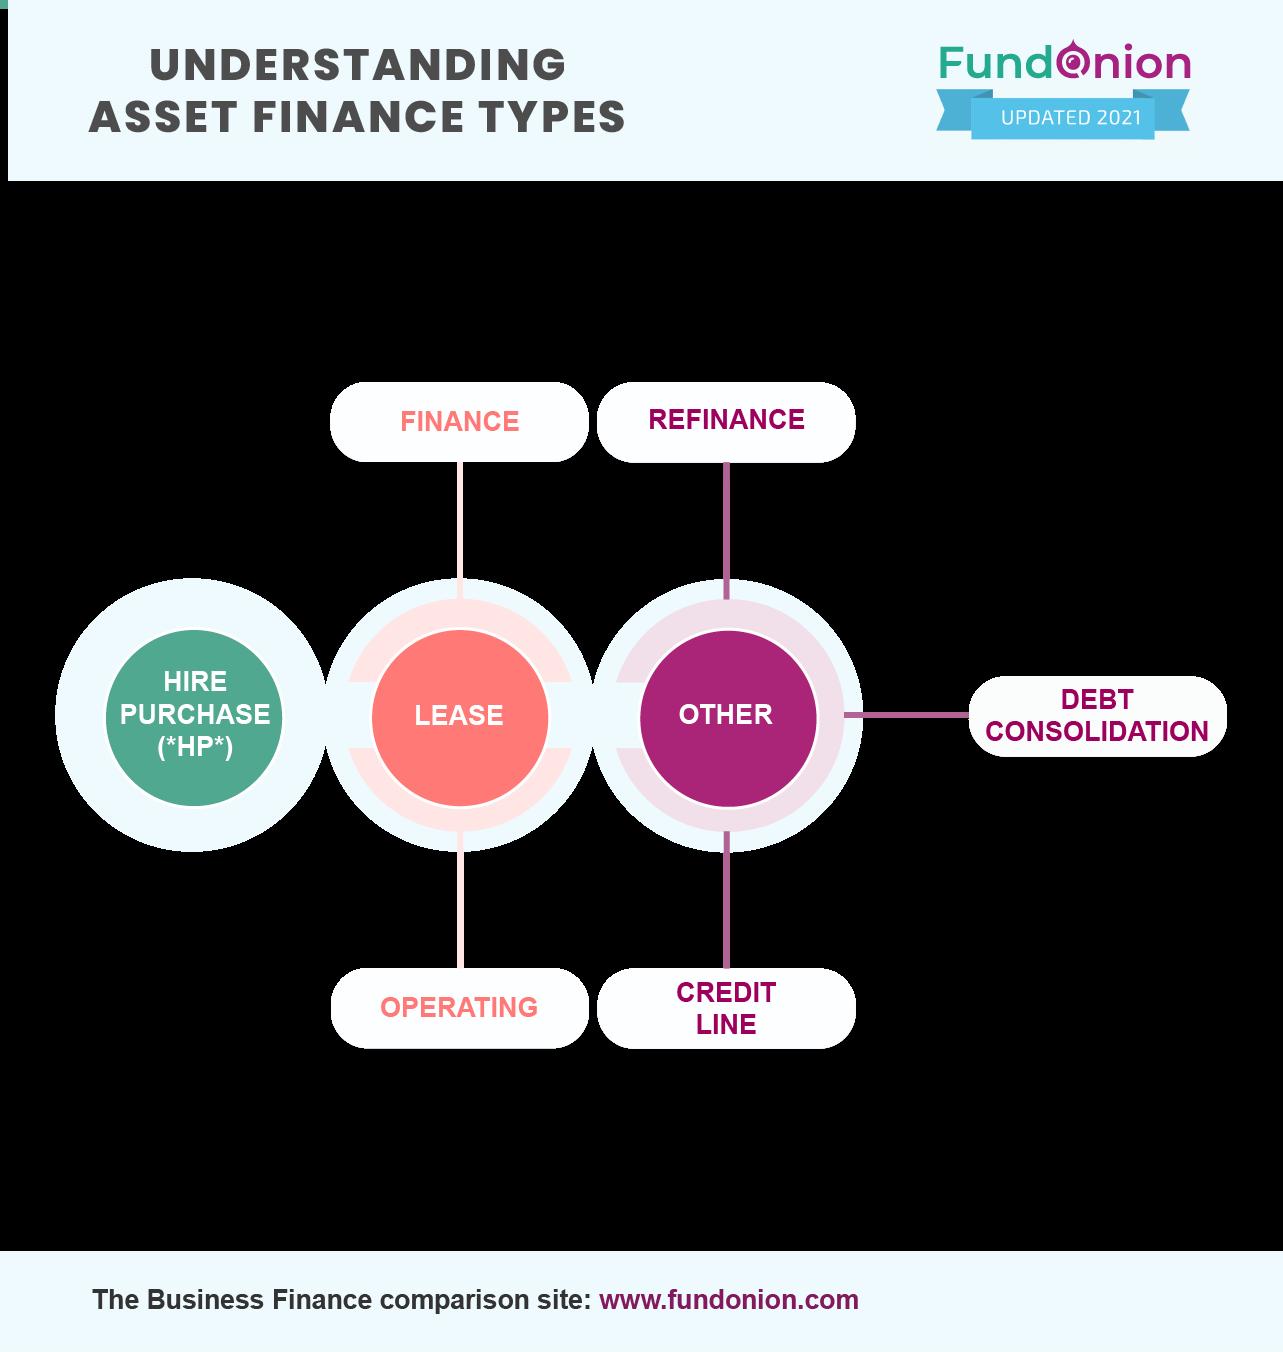 Understanding Asset Finance Types_Infographic